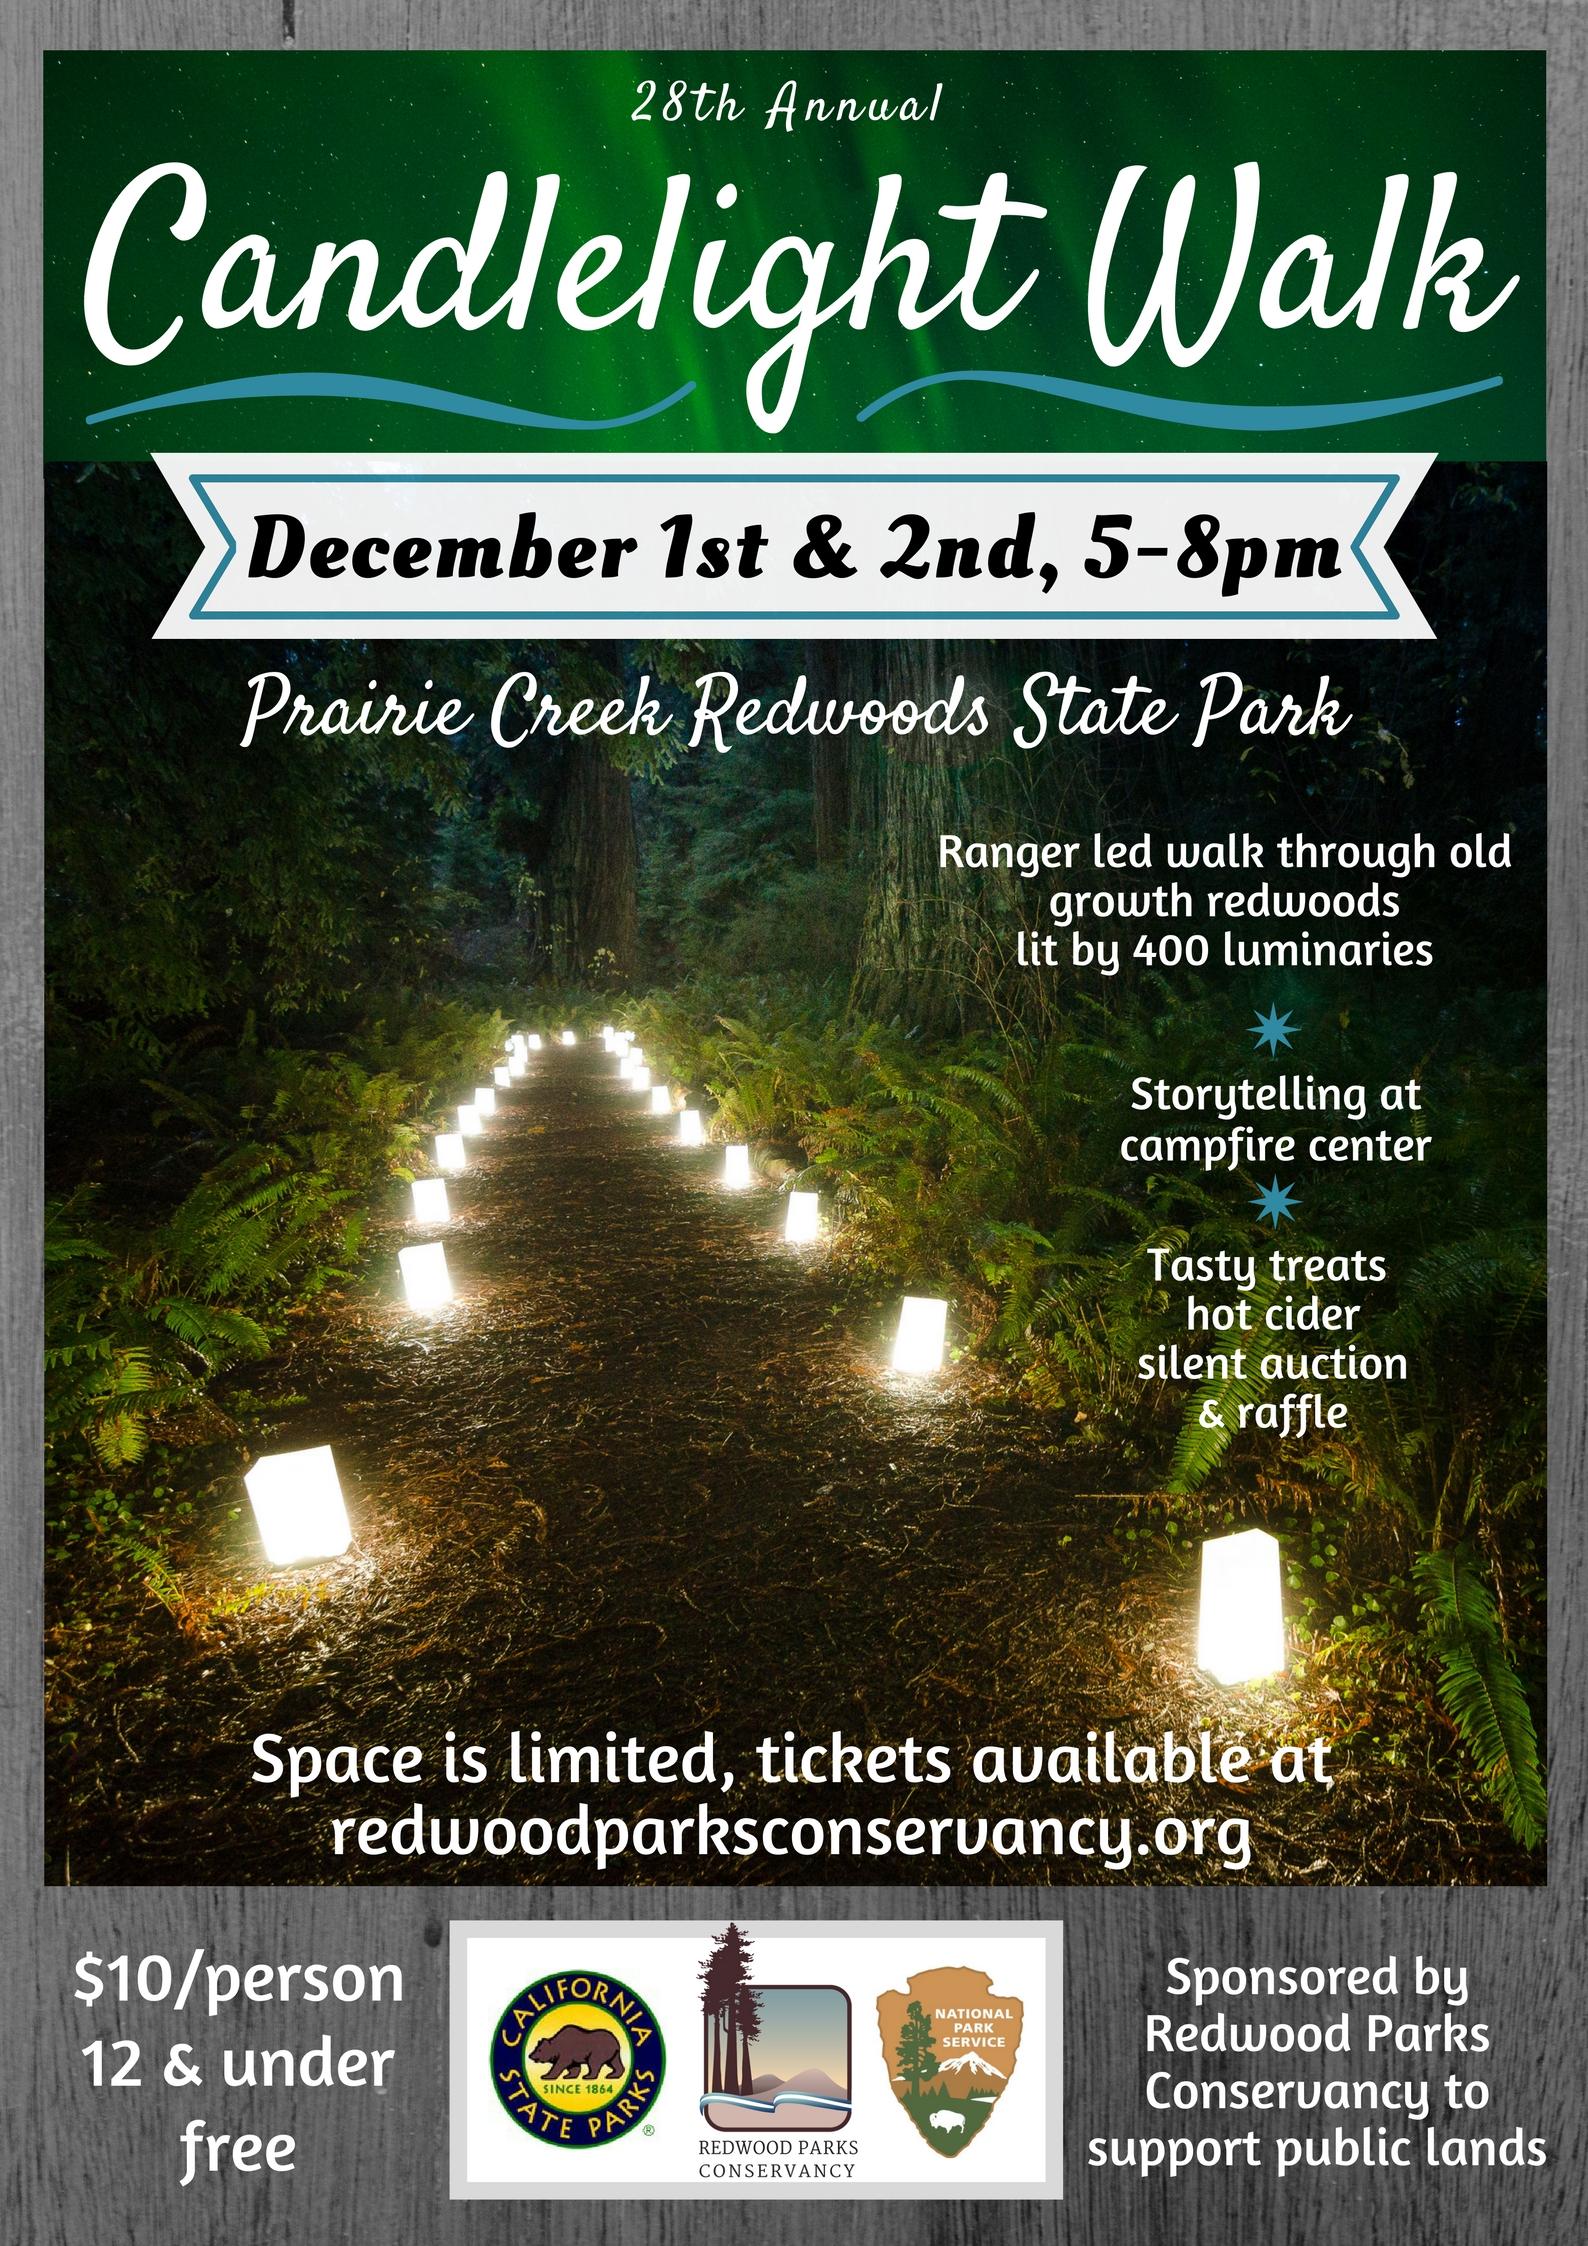 Candlelight Walk at Prairie Creek Redwoods